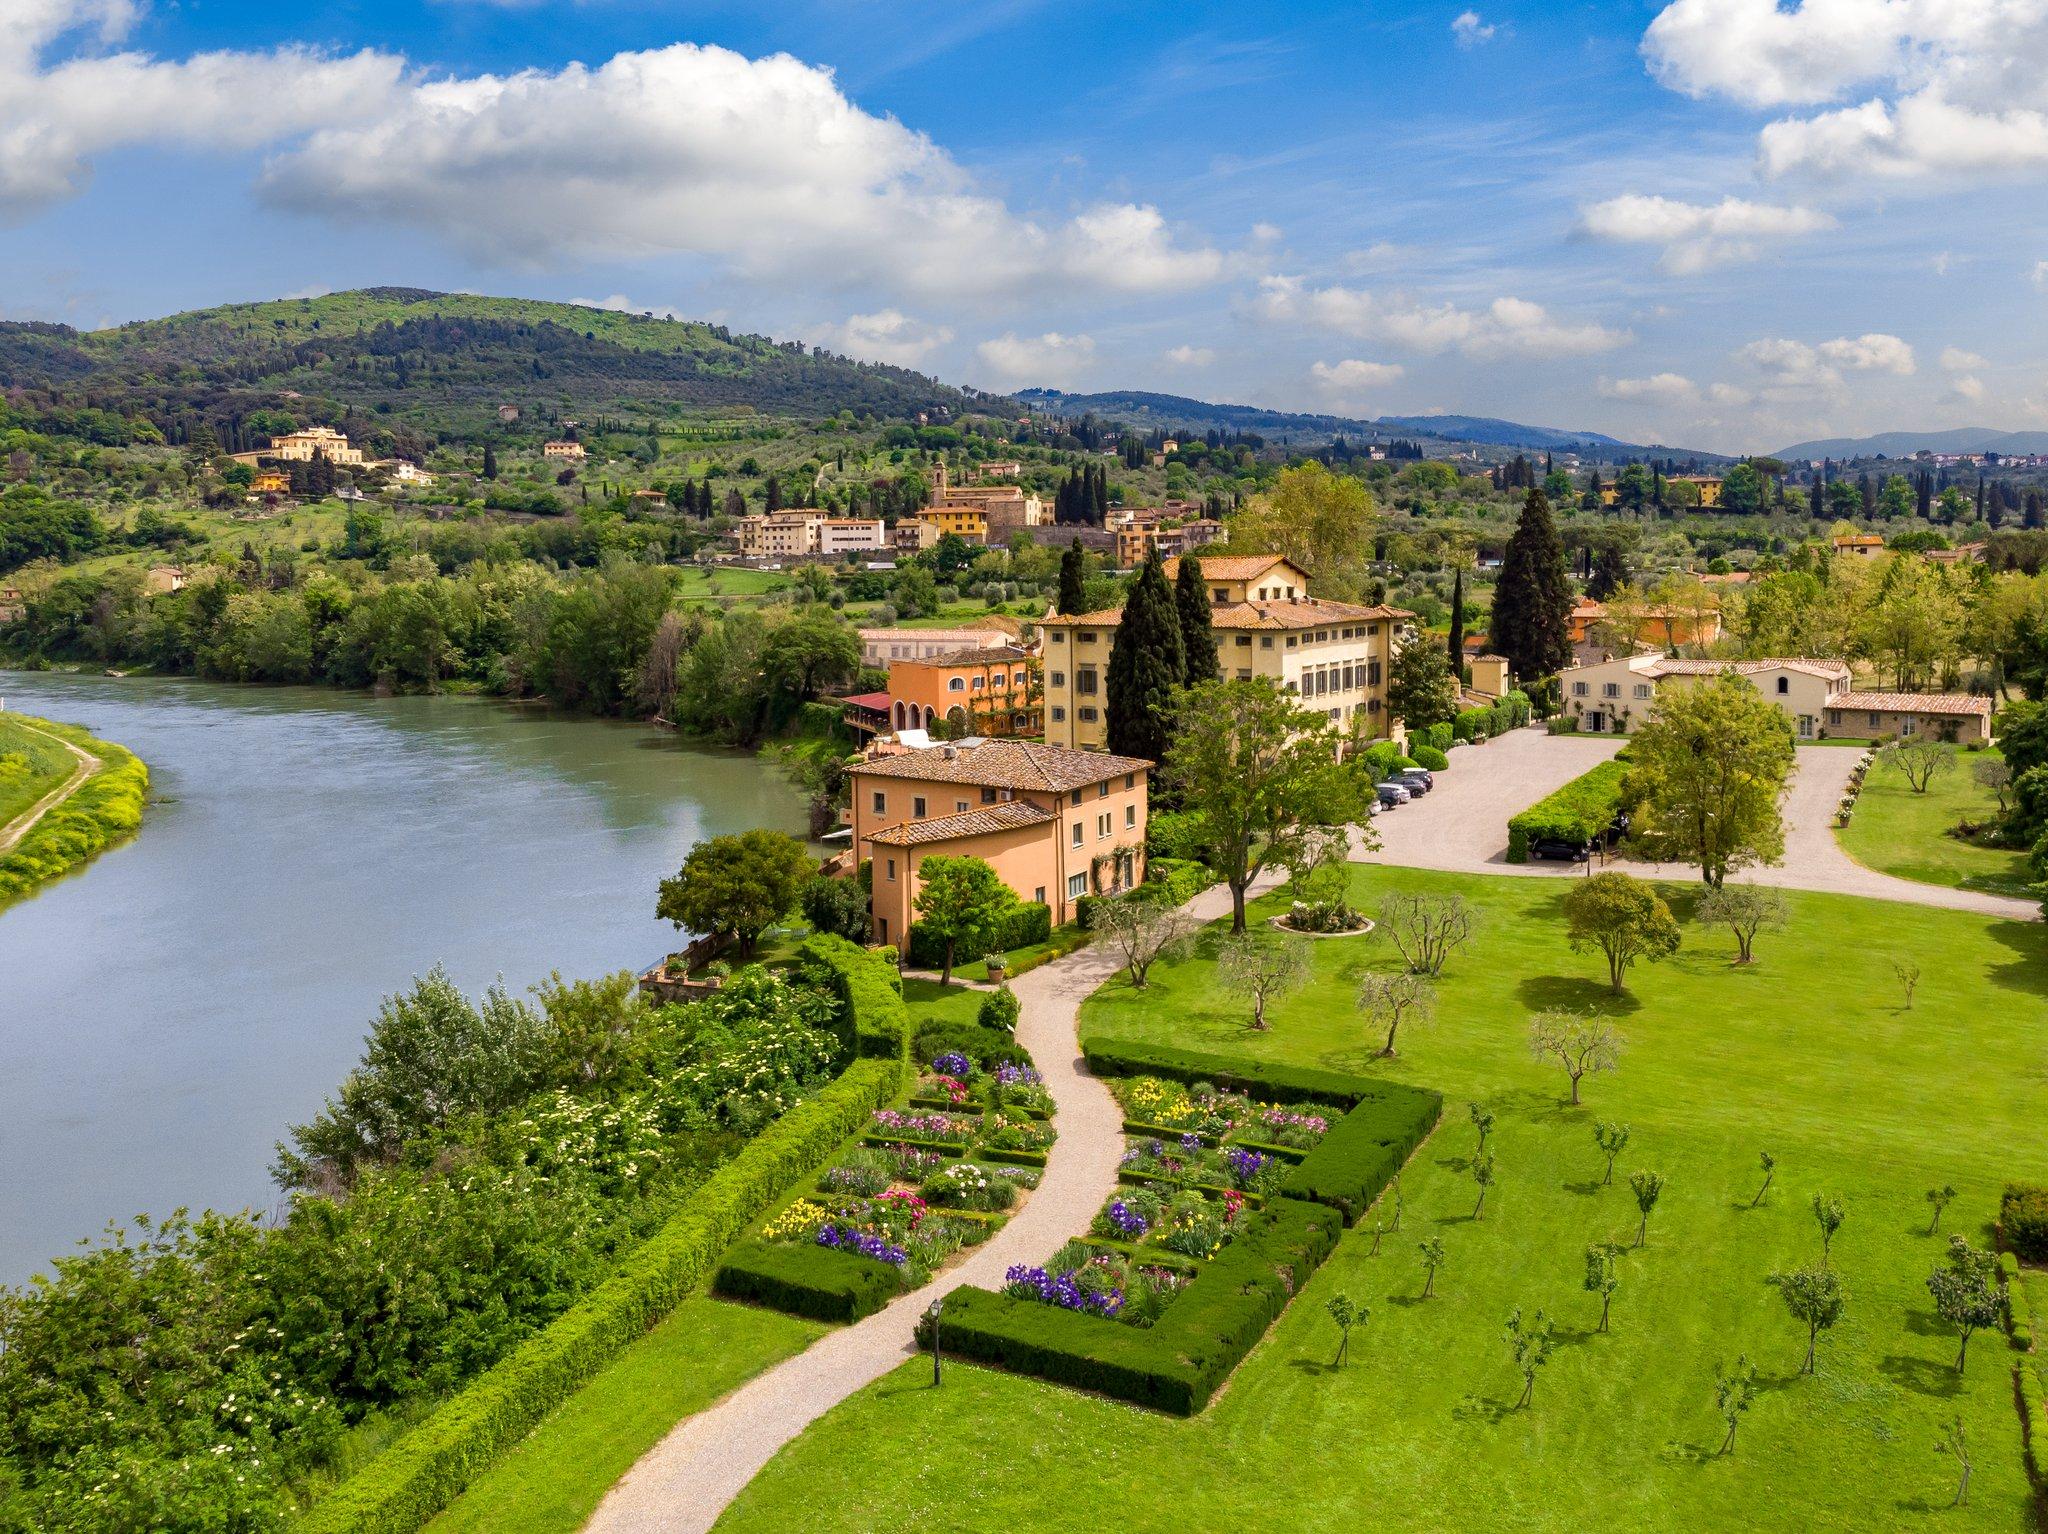 Villa La Massa- Florence, Italy Hotels- Deluxe Hotels in ...